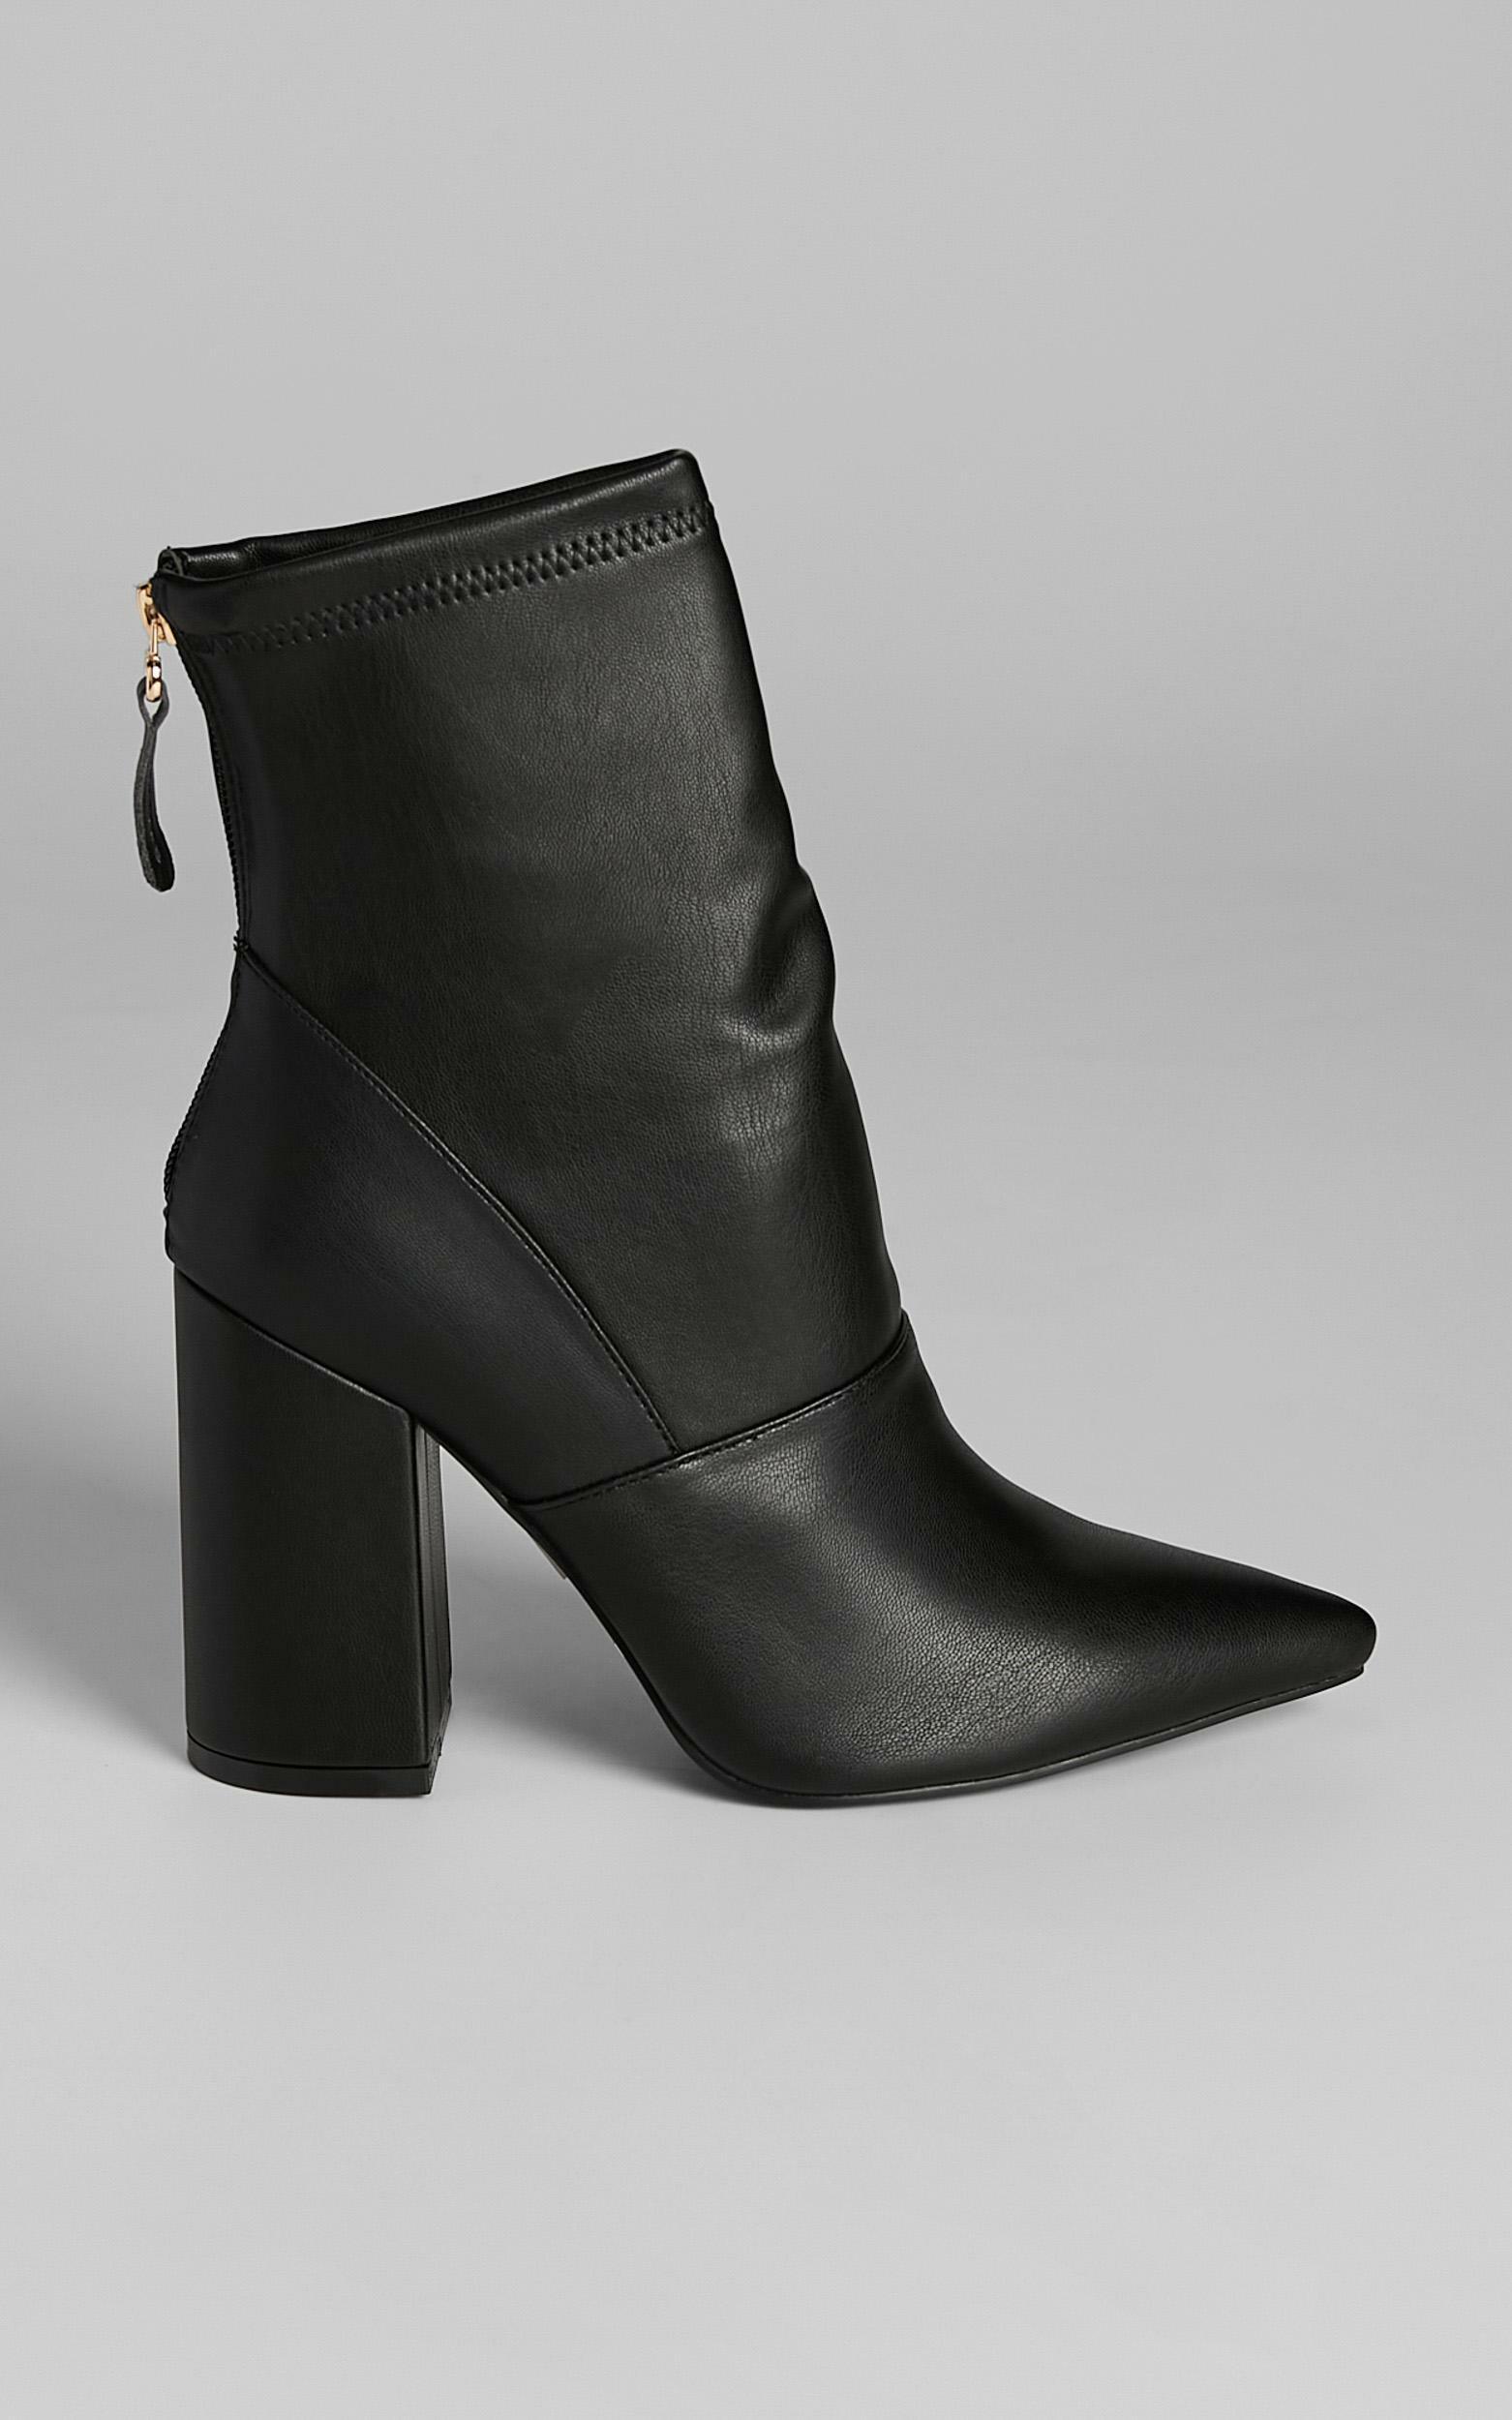 Billini - Thatcher Boots in Black - 5, Black, hi-res image number null